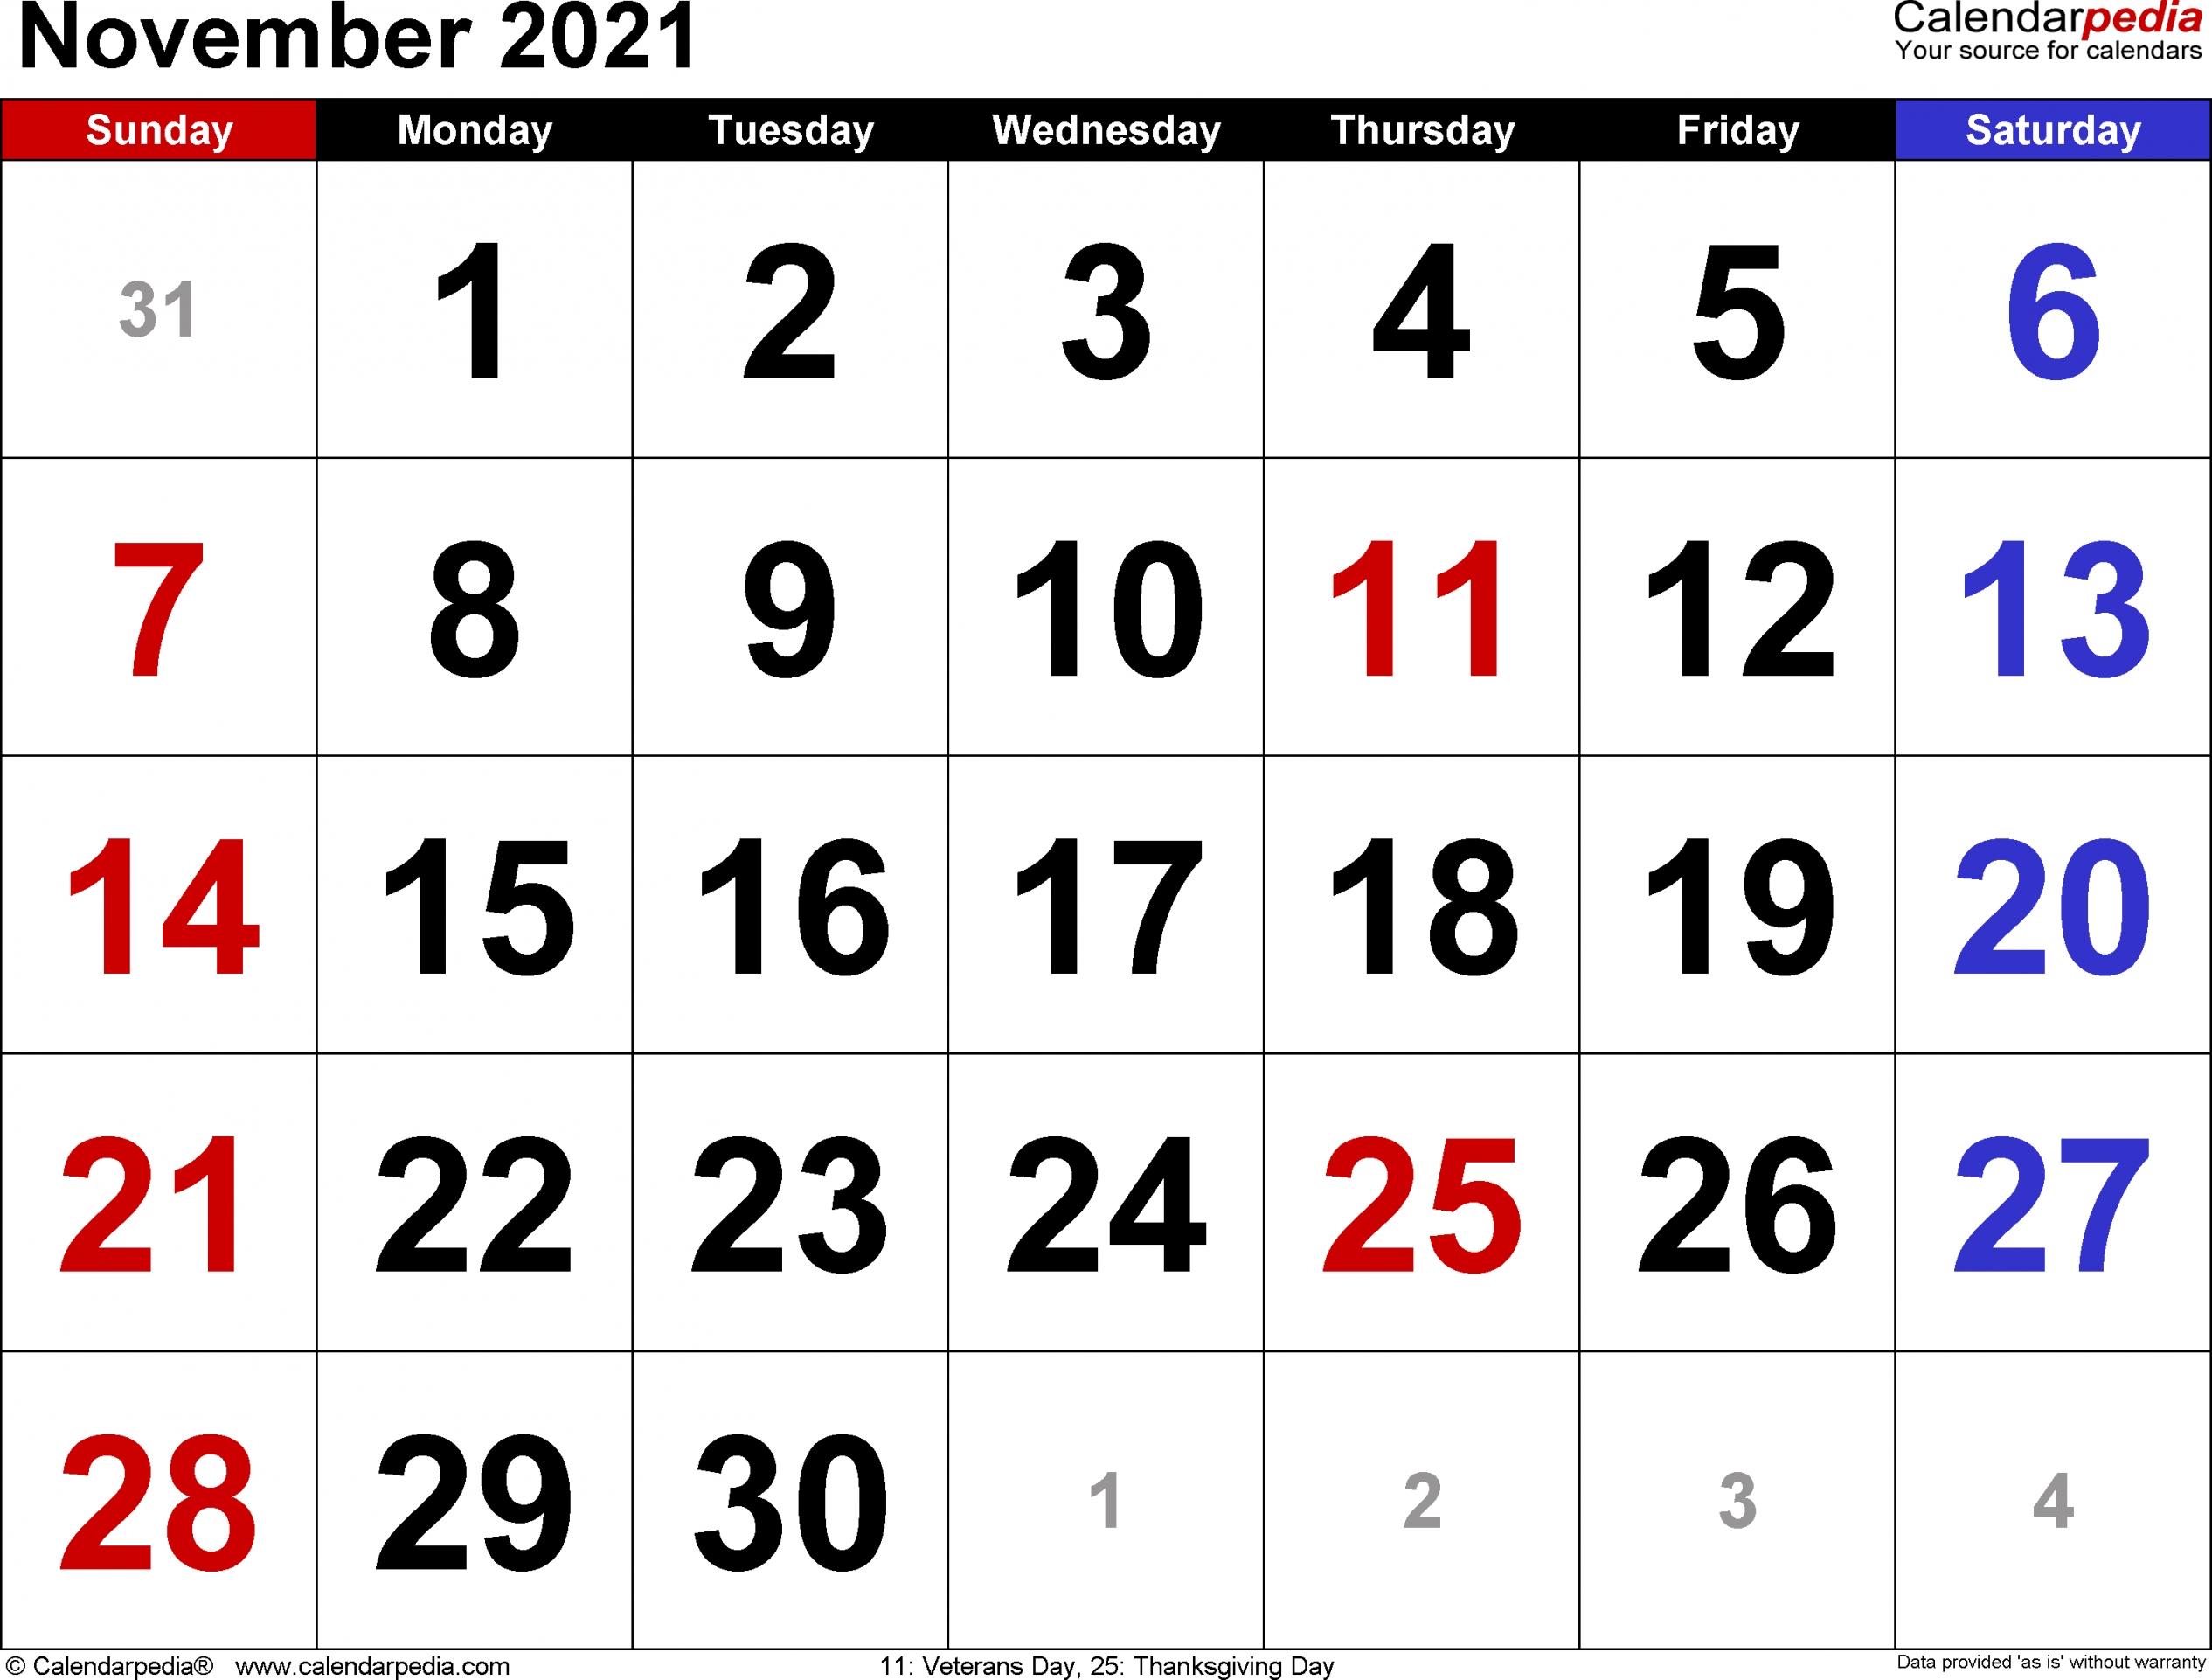 2021 November Calendar Printable | Free Letter Templates